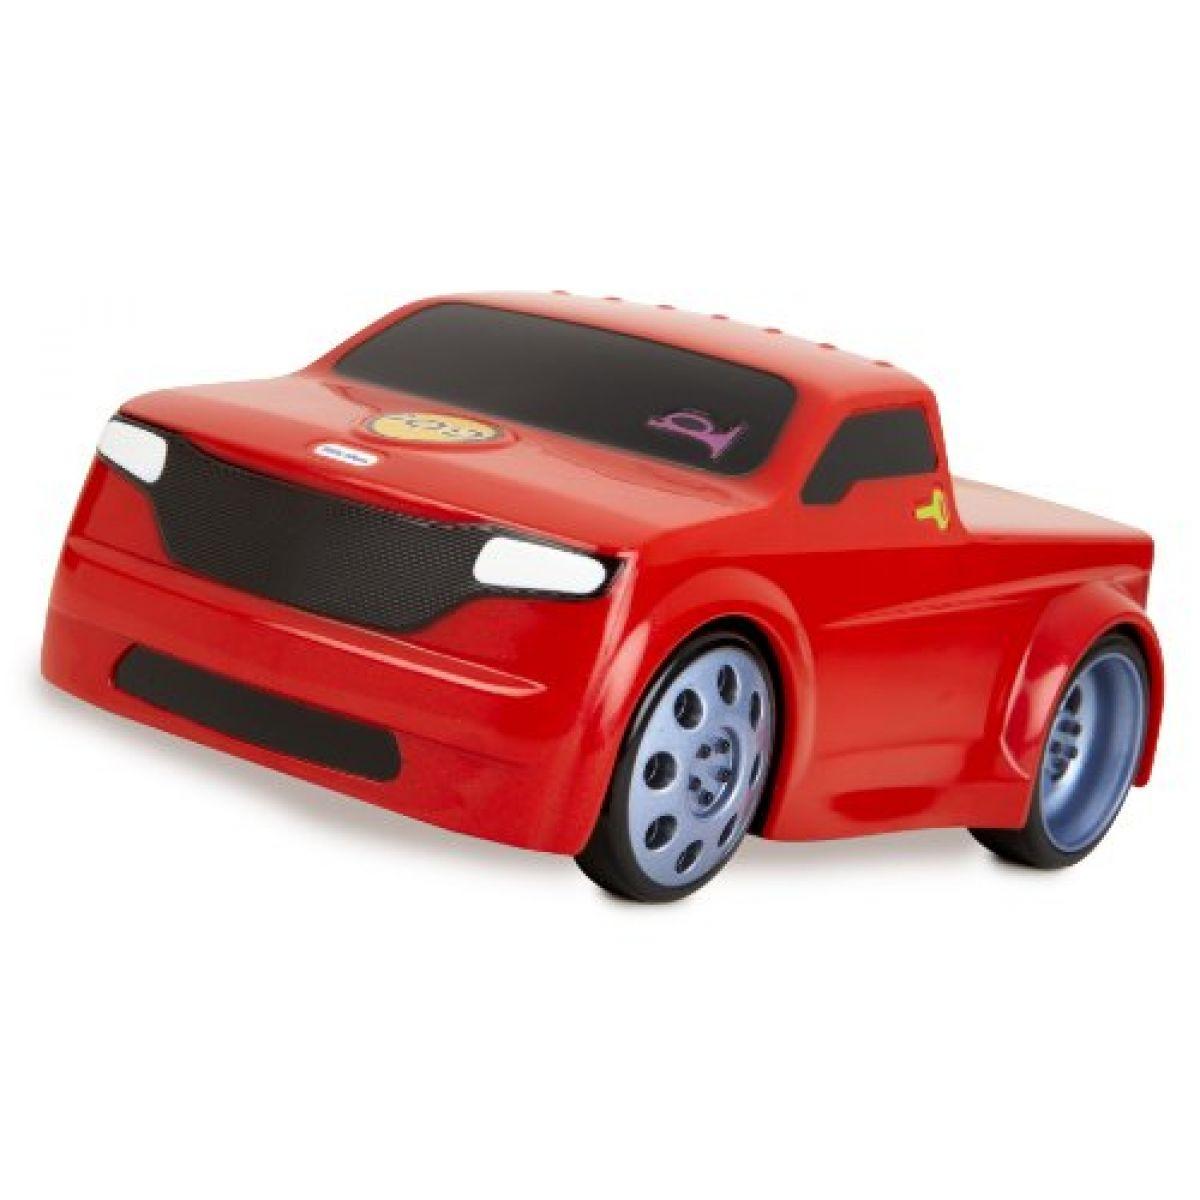 Little Tikes 635335 Interaktívne červené autíčko